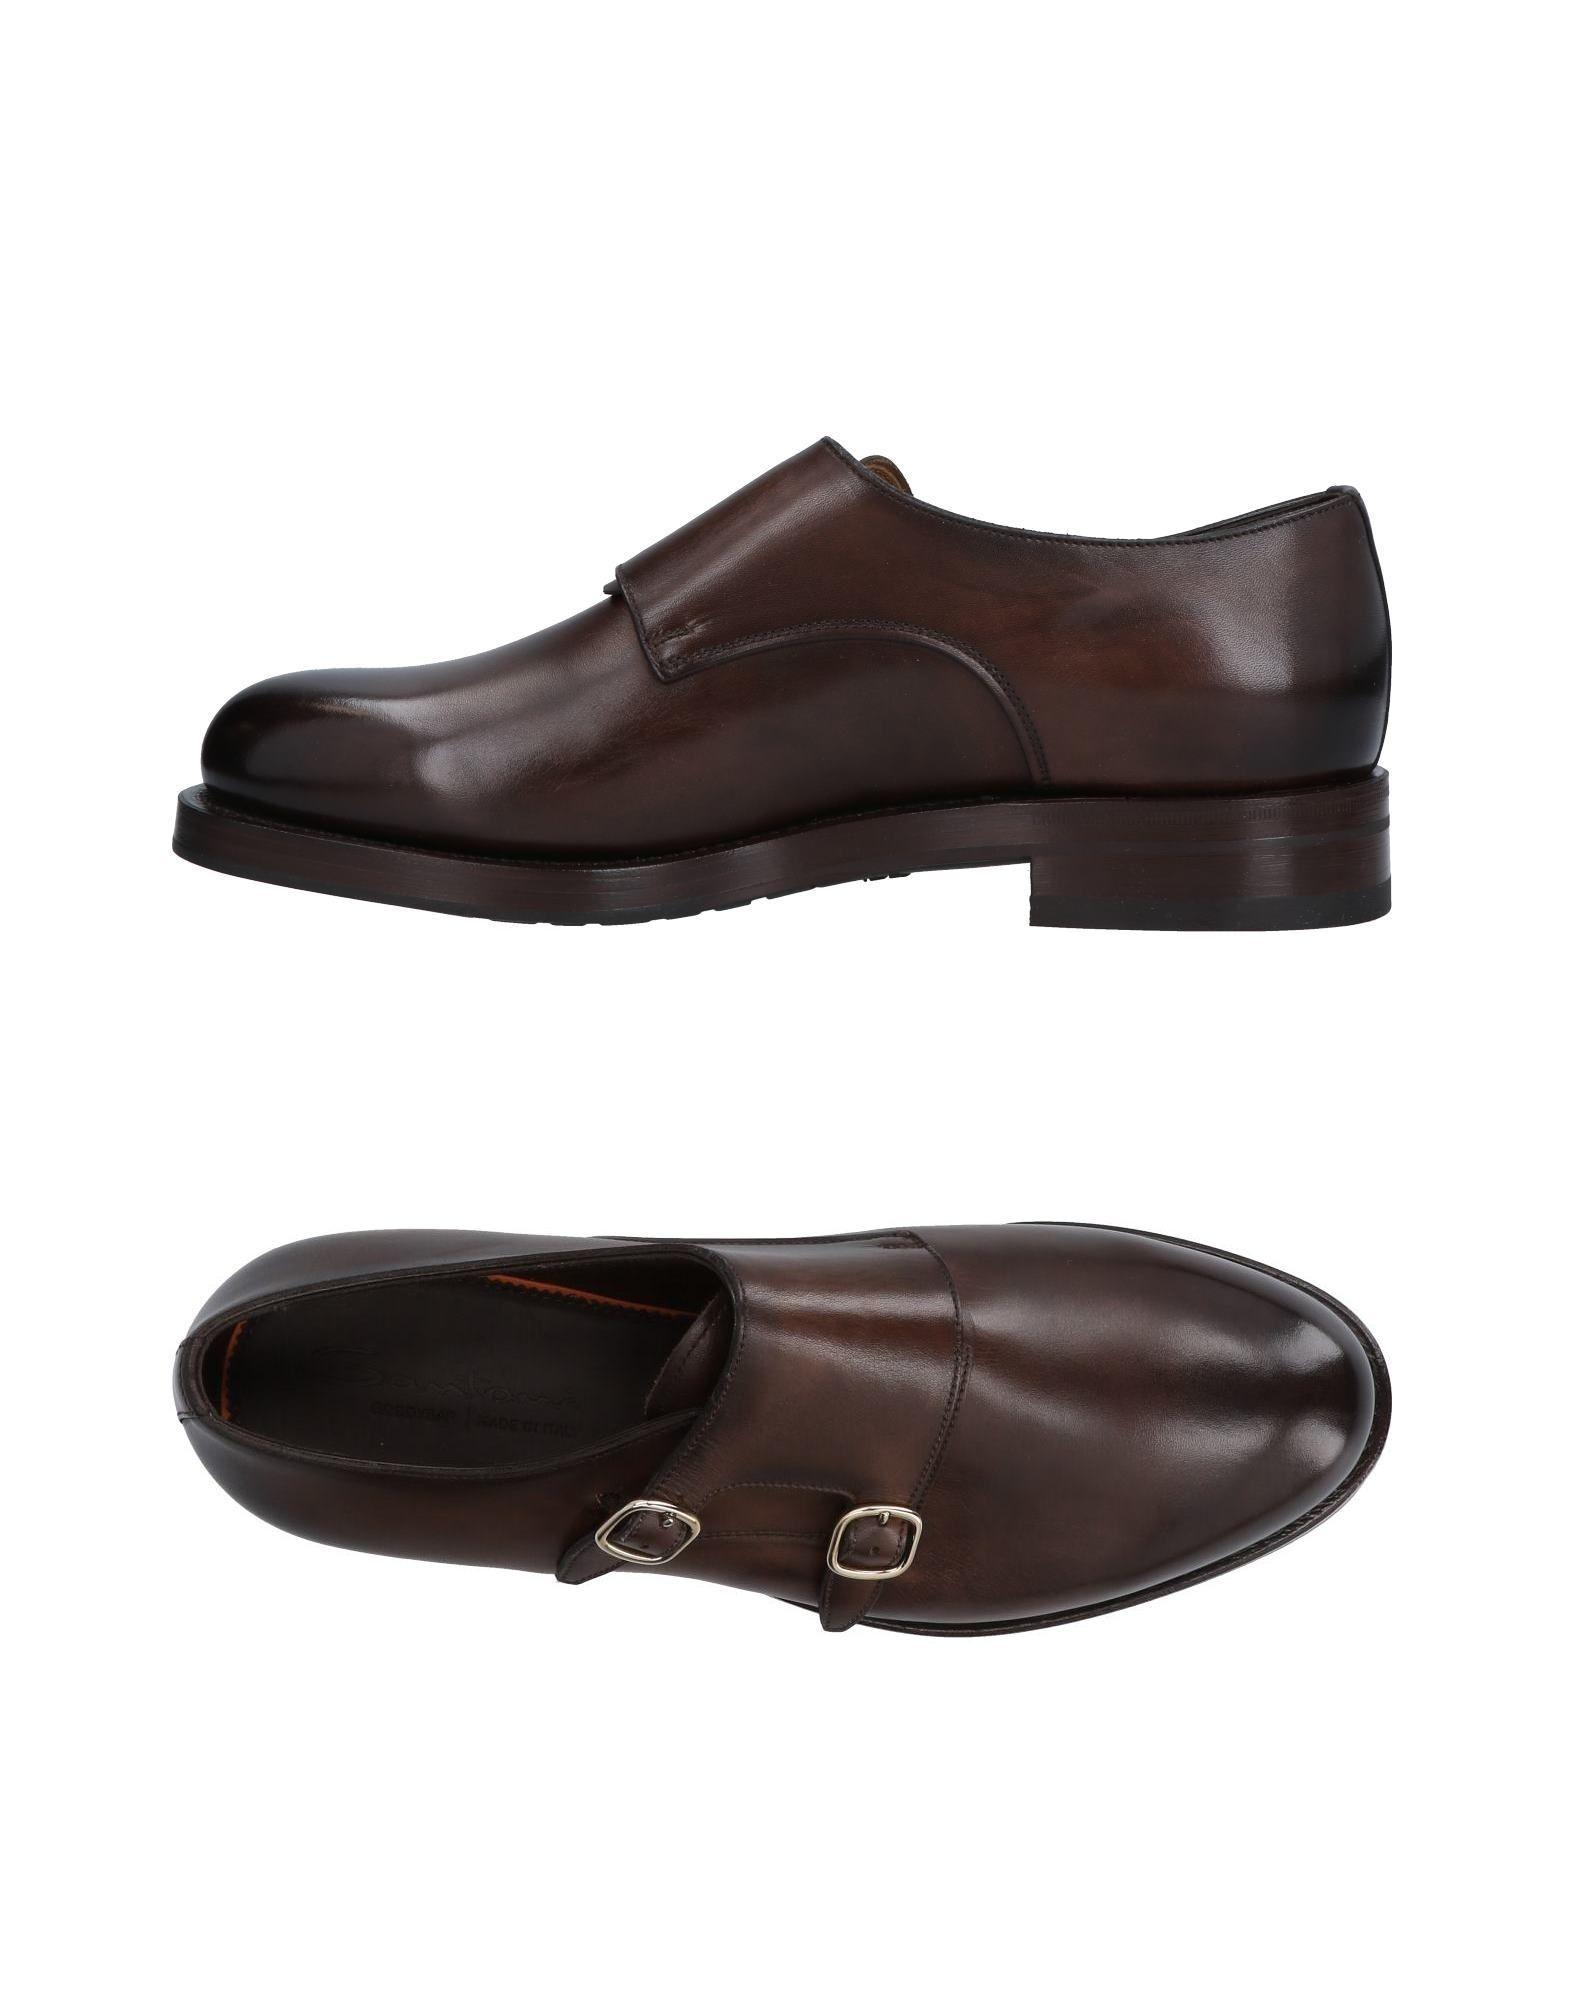 Santoni Mokassins Herren  11478978DG Gute Qualität beliebte Schuhe